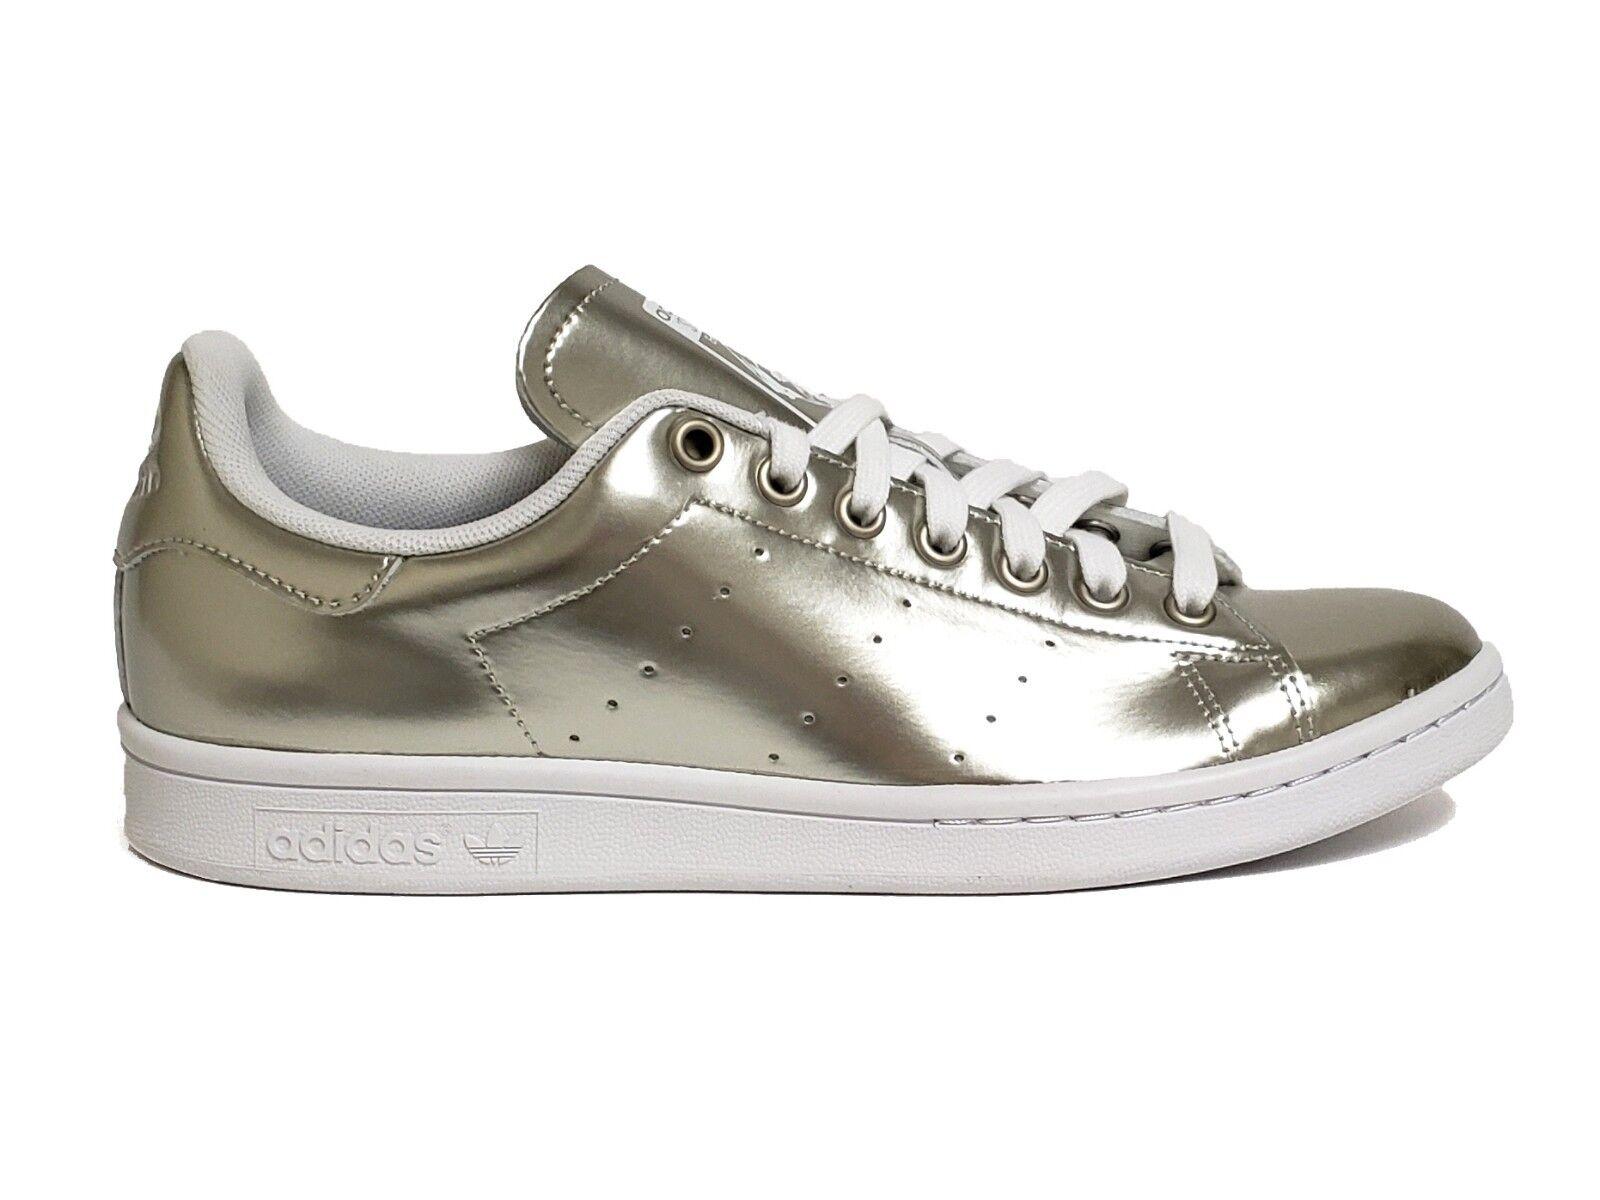 Adidas Women's STAN SMITH Shoes Cyber Metallic/White AQ6804 a Size 9